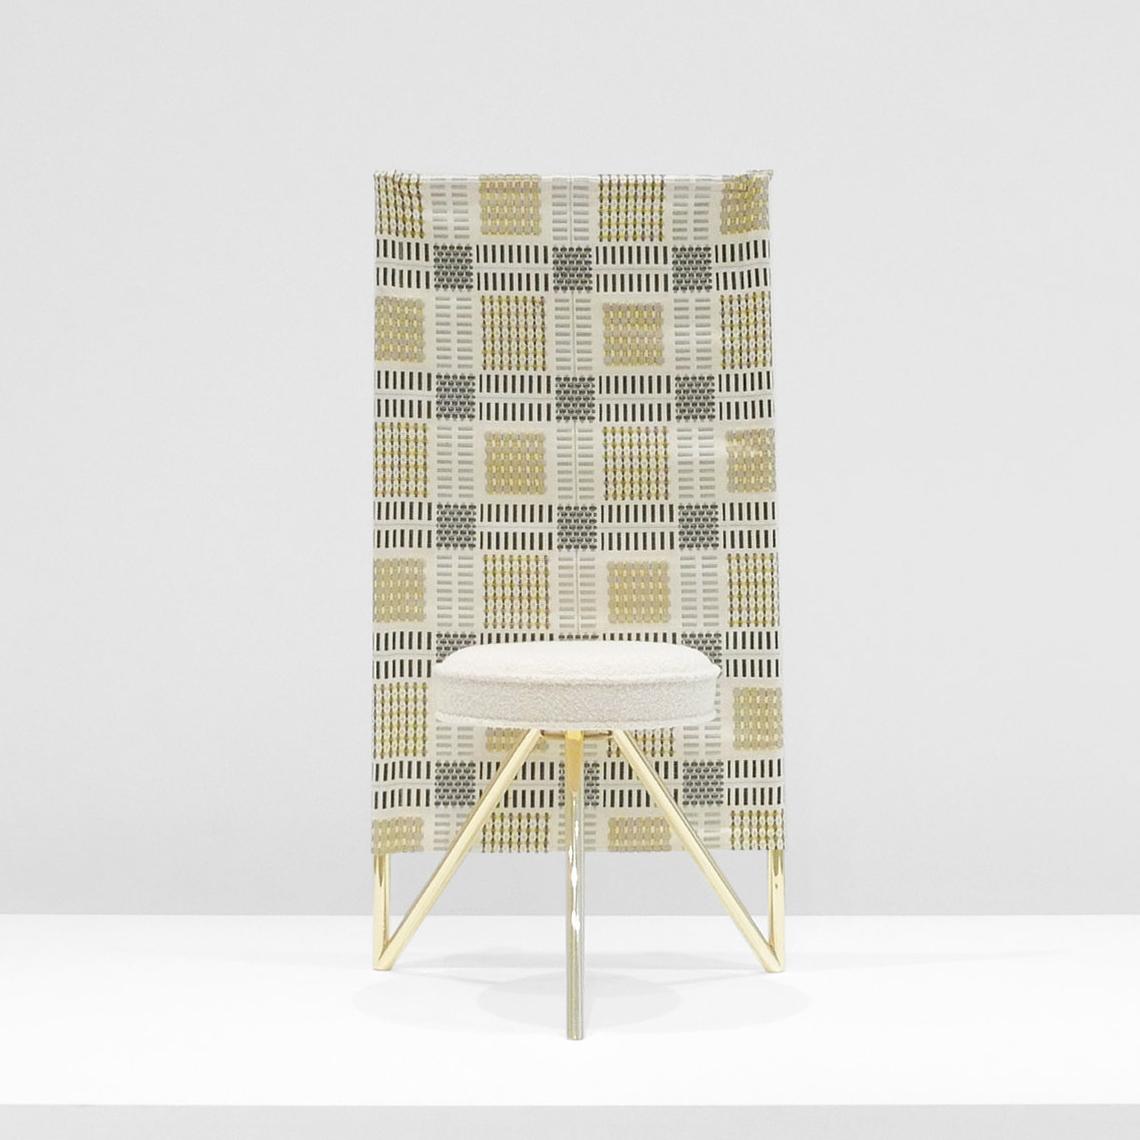 philippe starck   'miss wirt' chair  c. 1982 ...